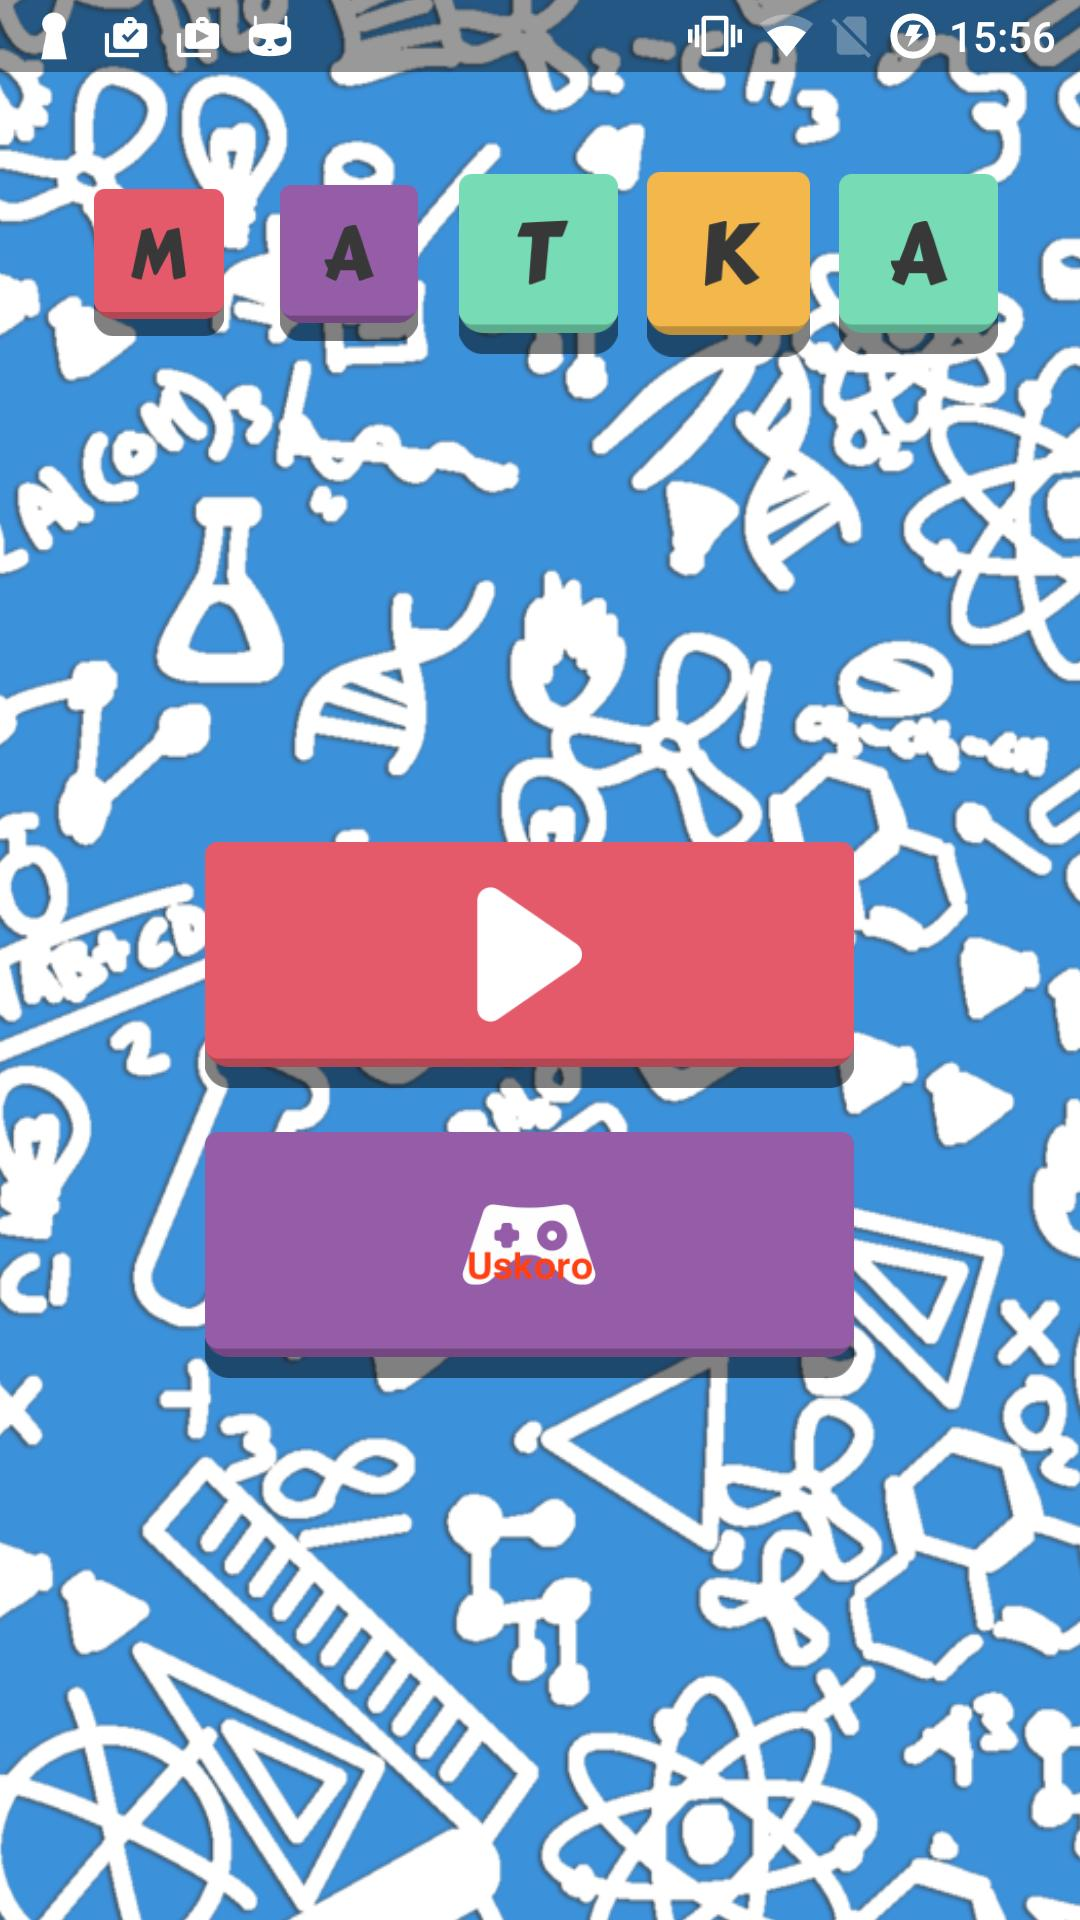 Matka - Matematika za svakoga screenshot 1